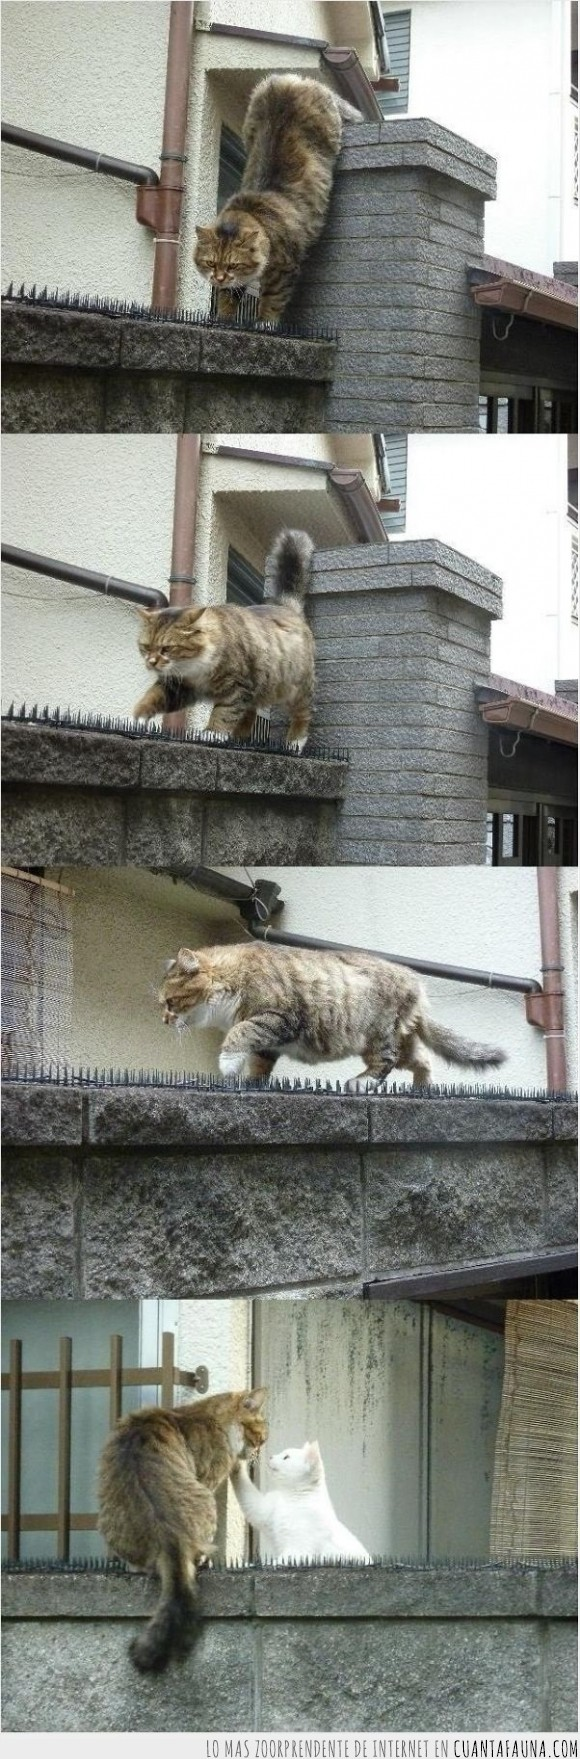 amor,gata,gato,muro,peligro,pinchar,pinchos,riesgo